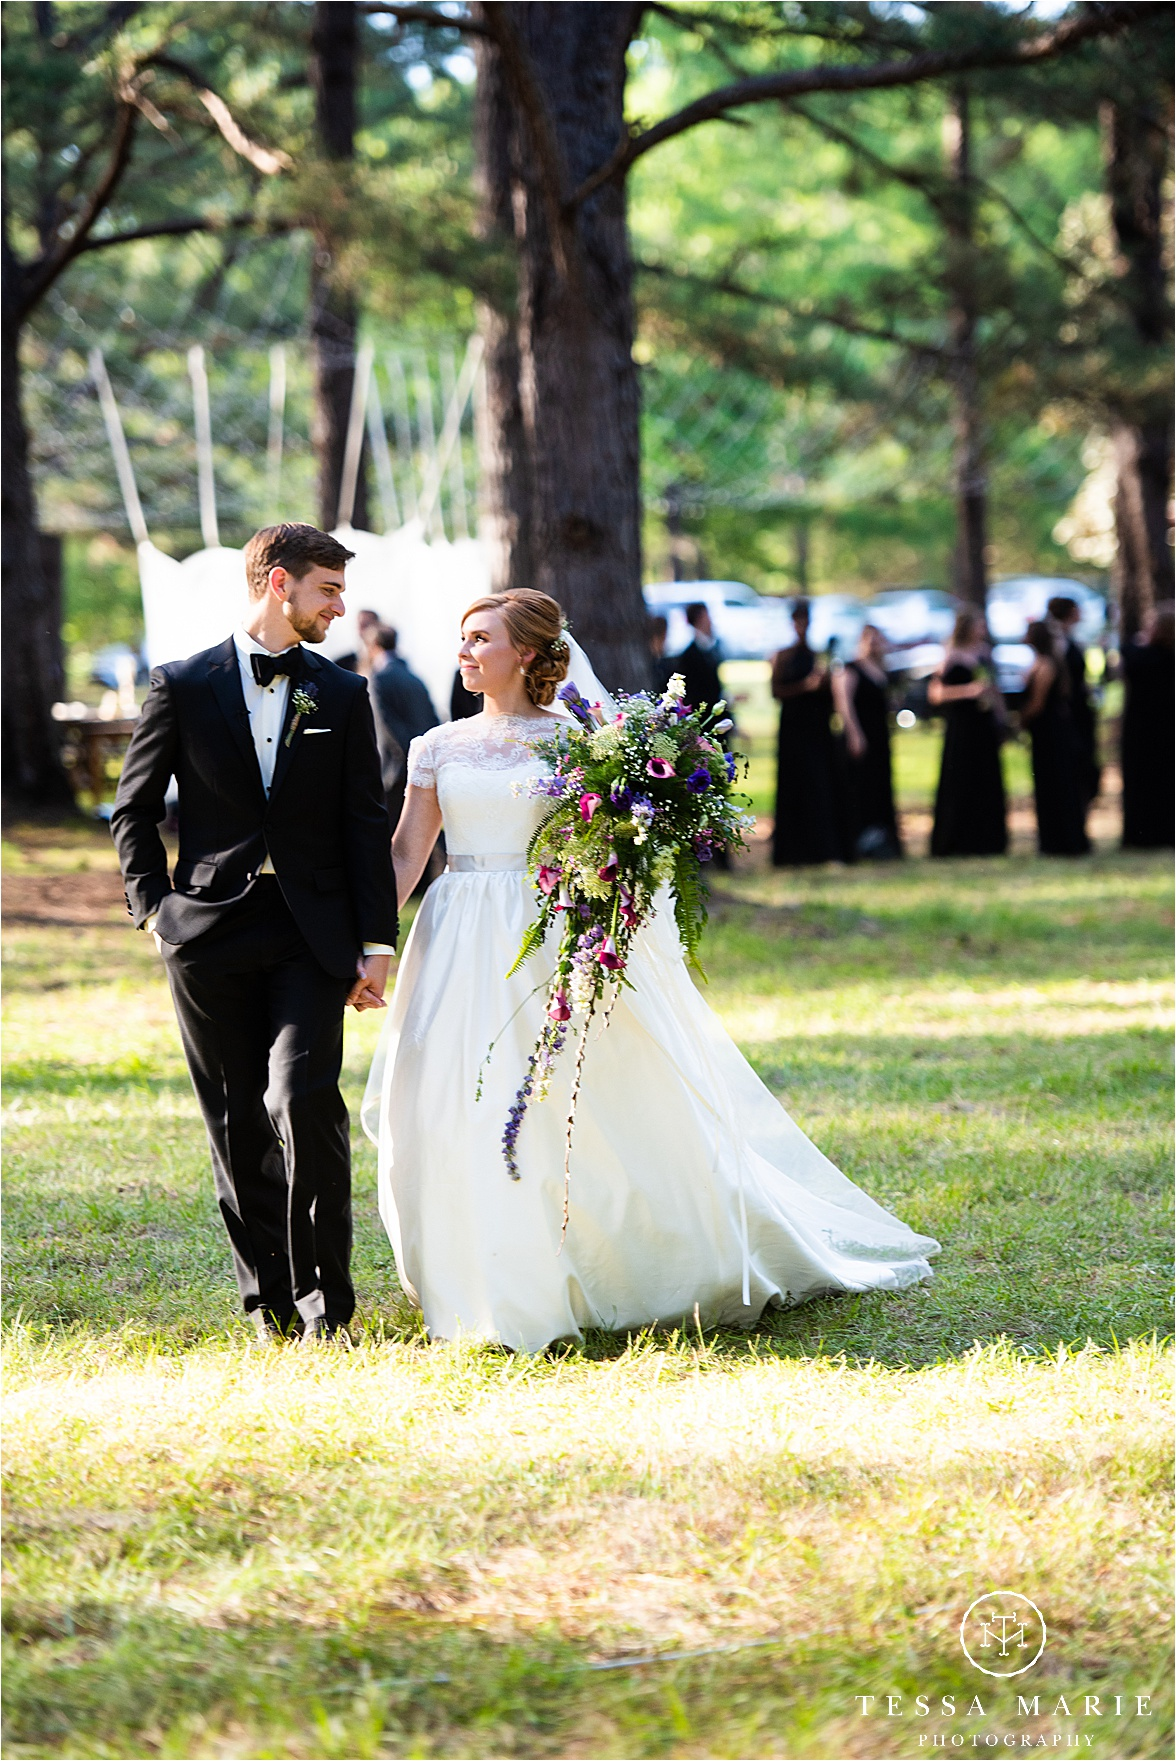 Tessa_marie_weddings_columbus_wedding_photographer_wedding_day_spring_outdoor_wedding_0100.jpg